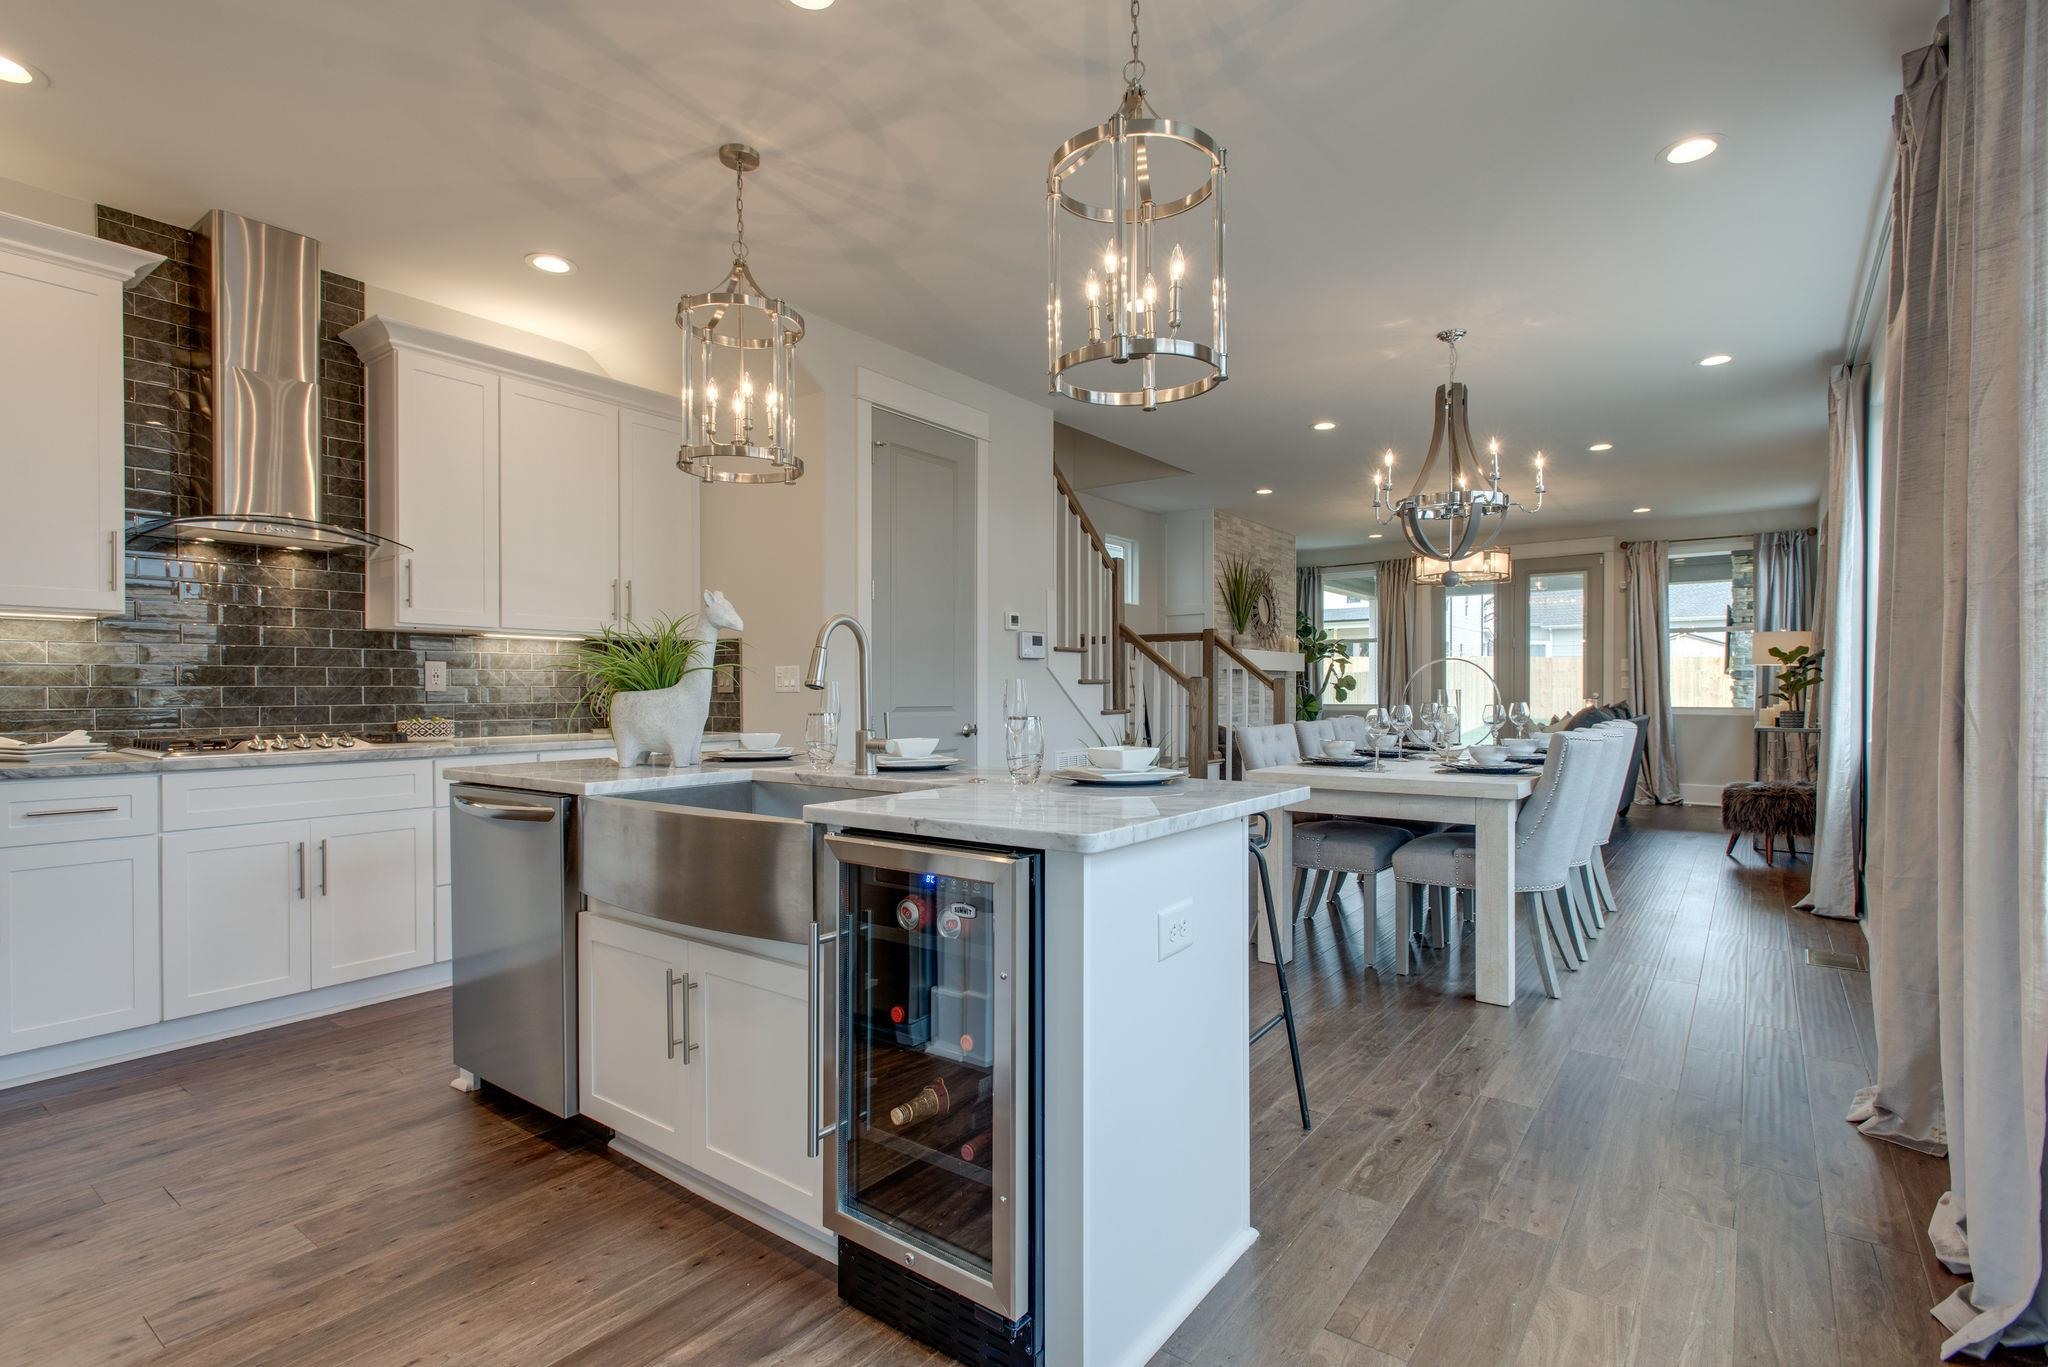 905A Delmas Ave, Nashville, TN 37216 - Nashville, TN real estate listing